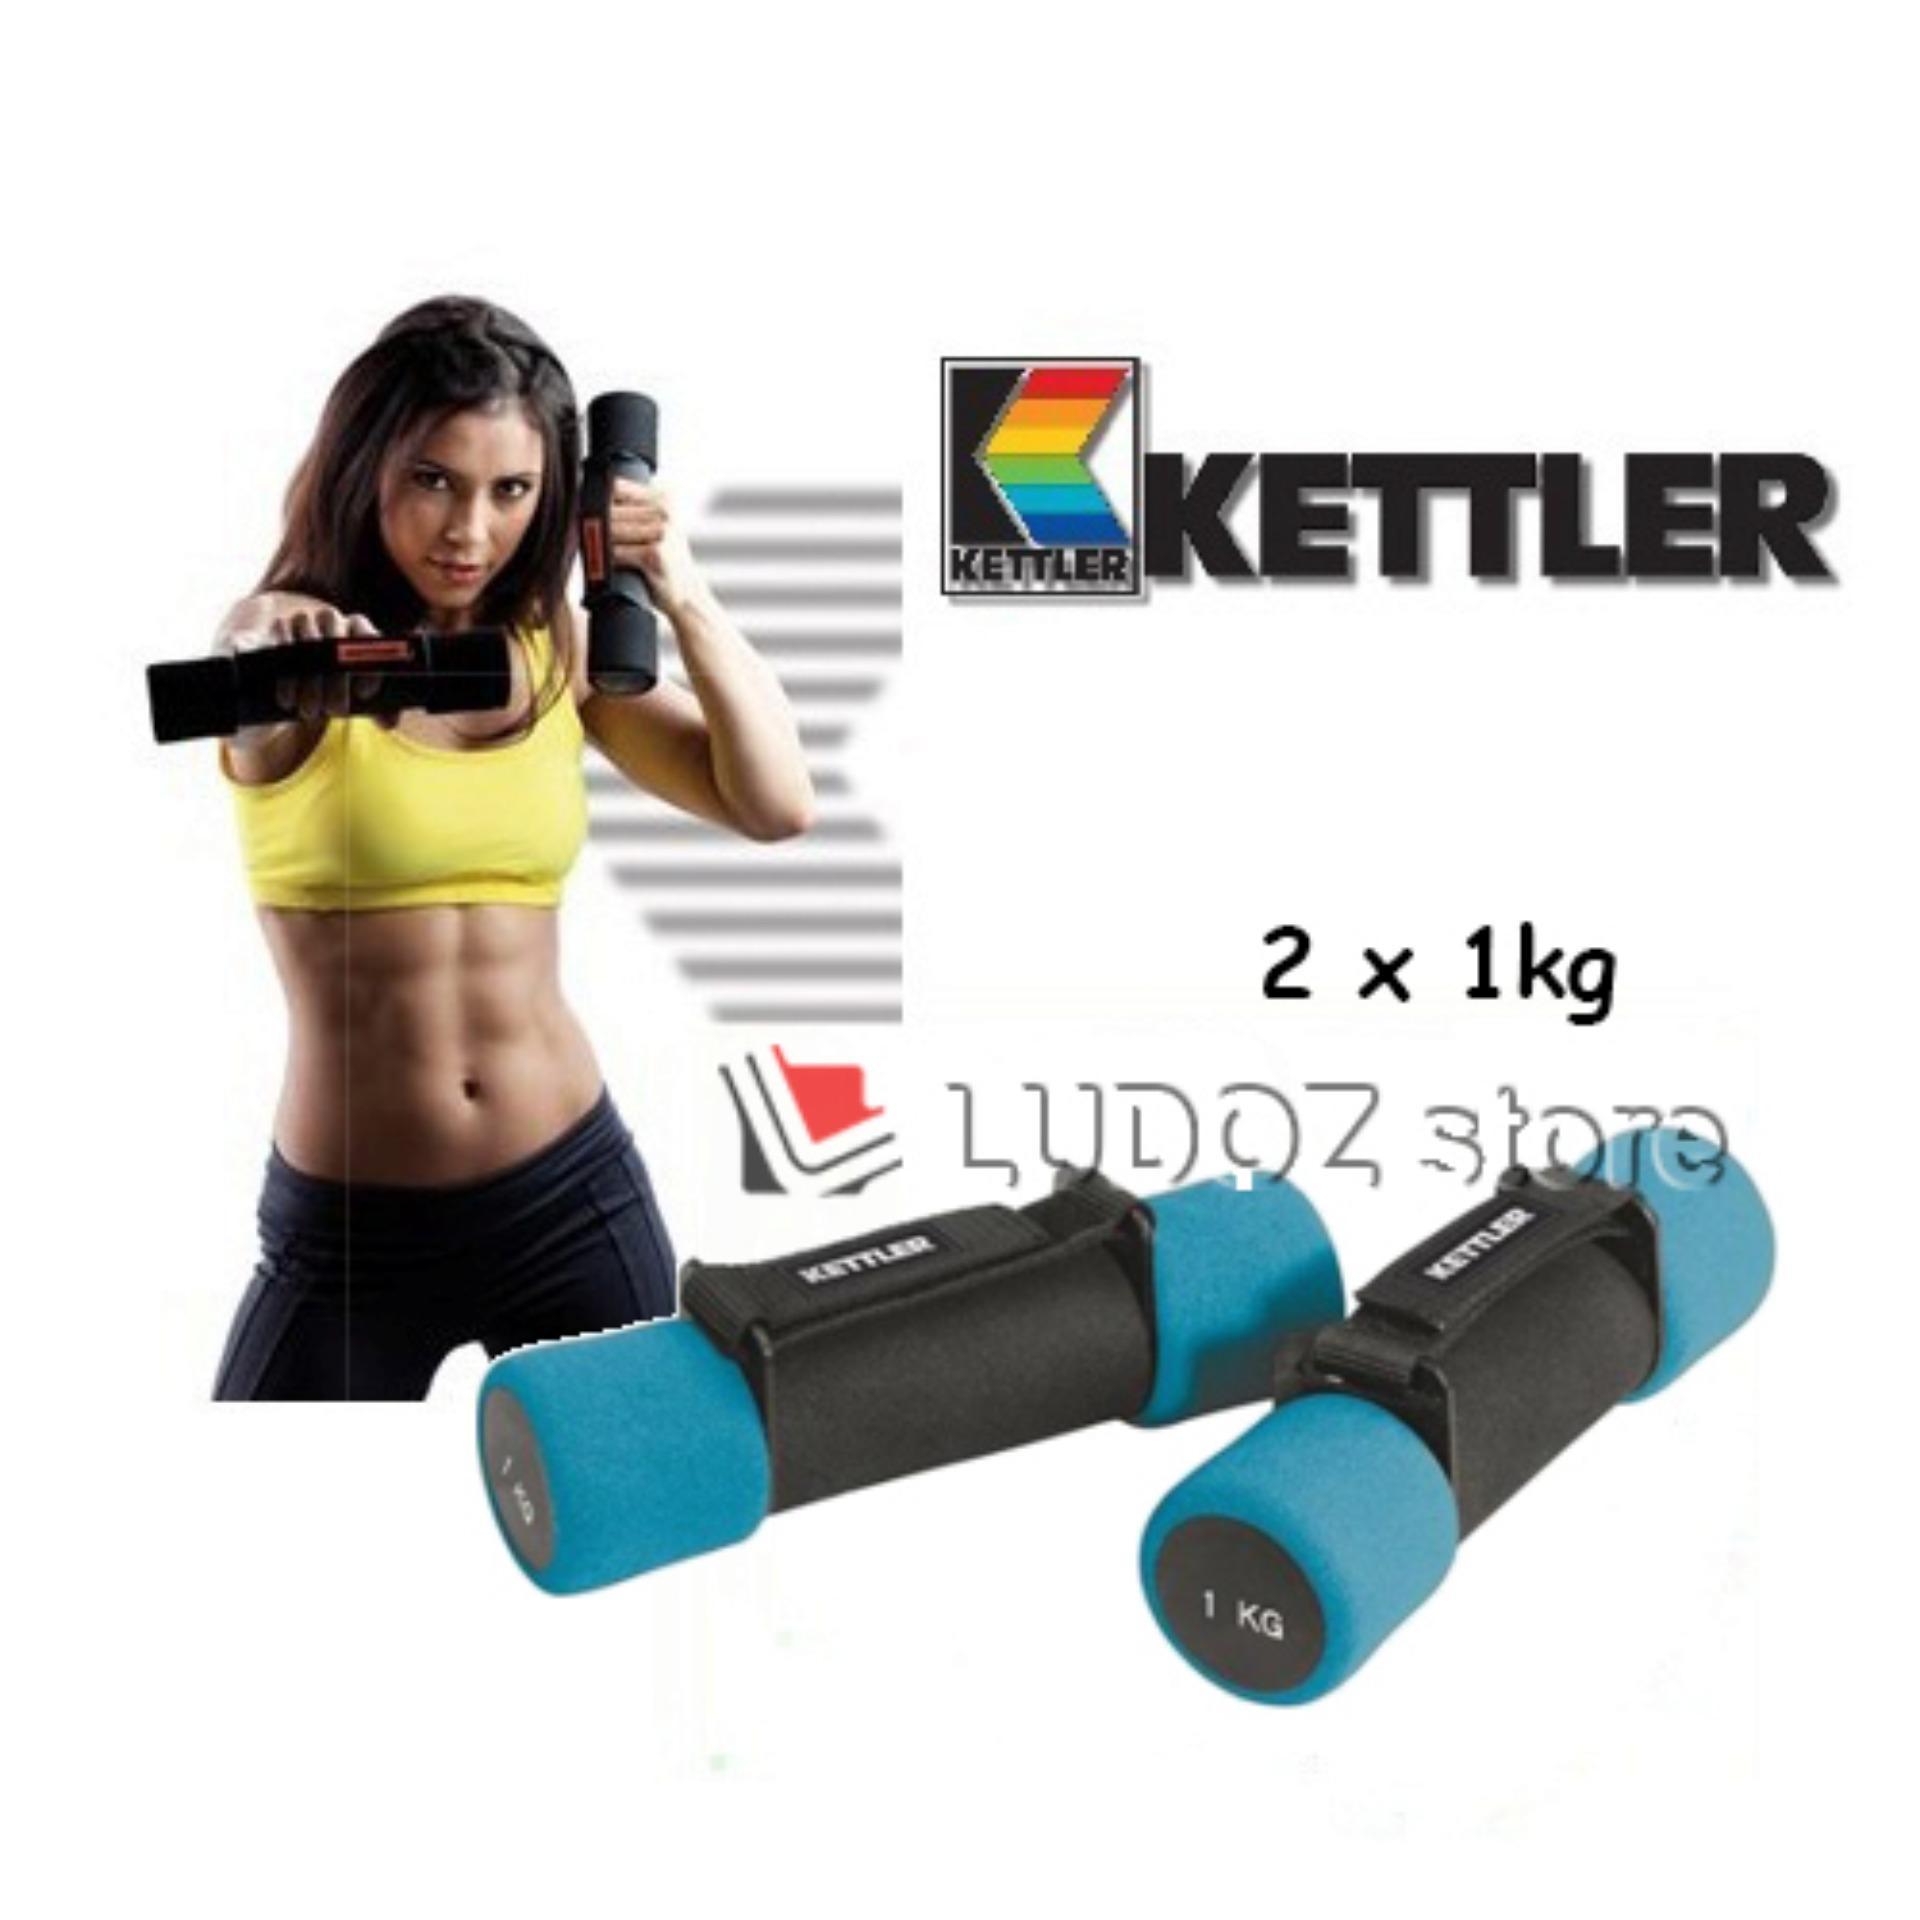 KETTLER Aerobic soft Dumbbell - 2kg/pair (2x 1.0kg) Fitness senam Aerobic